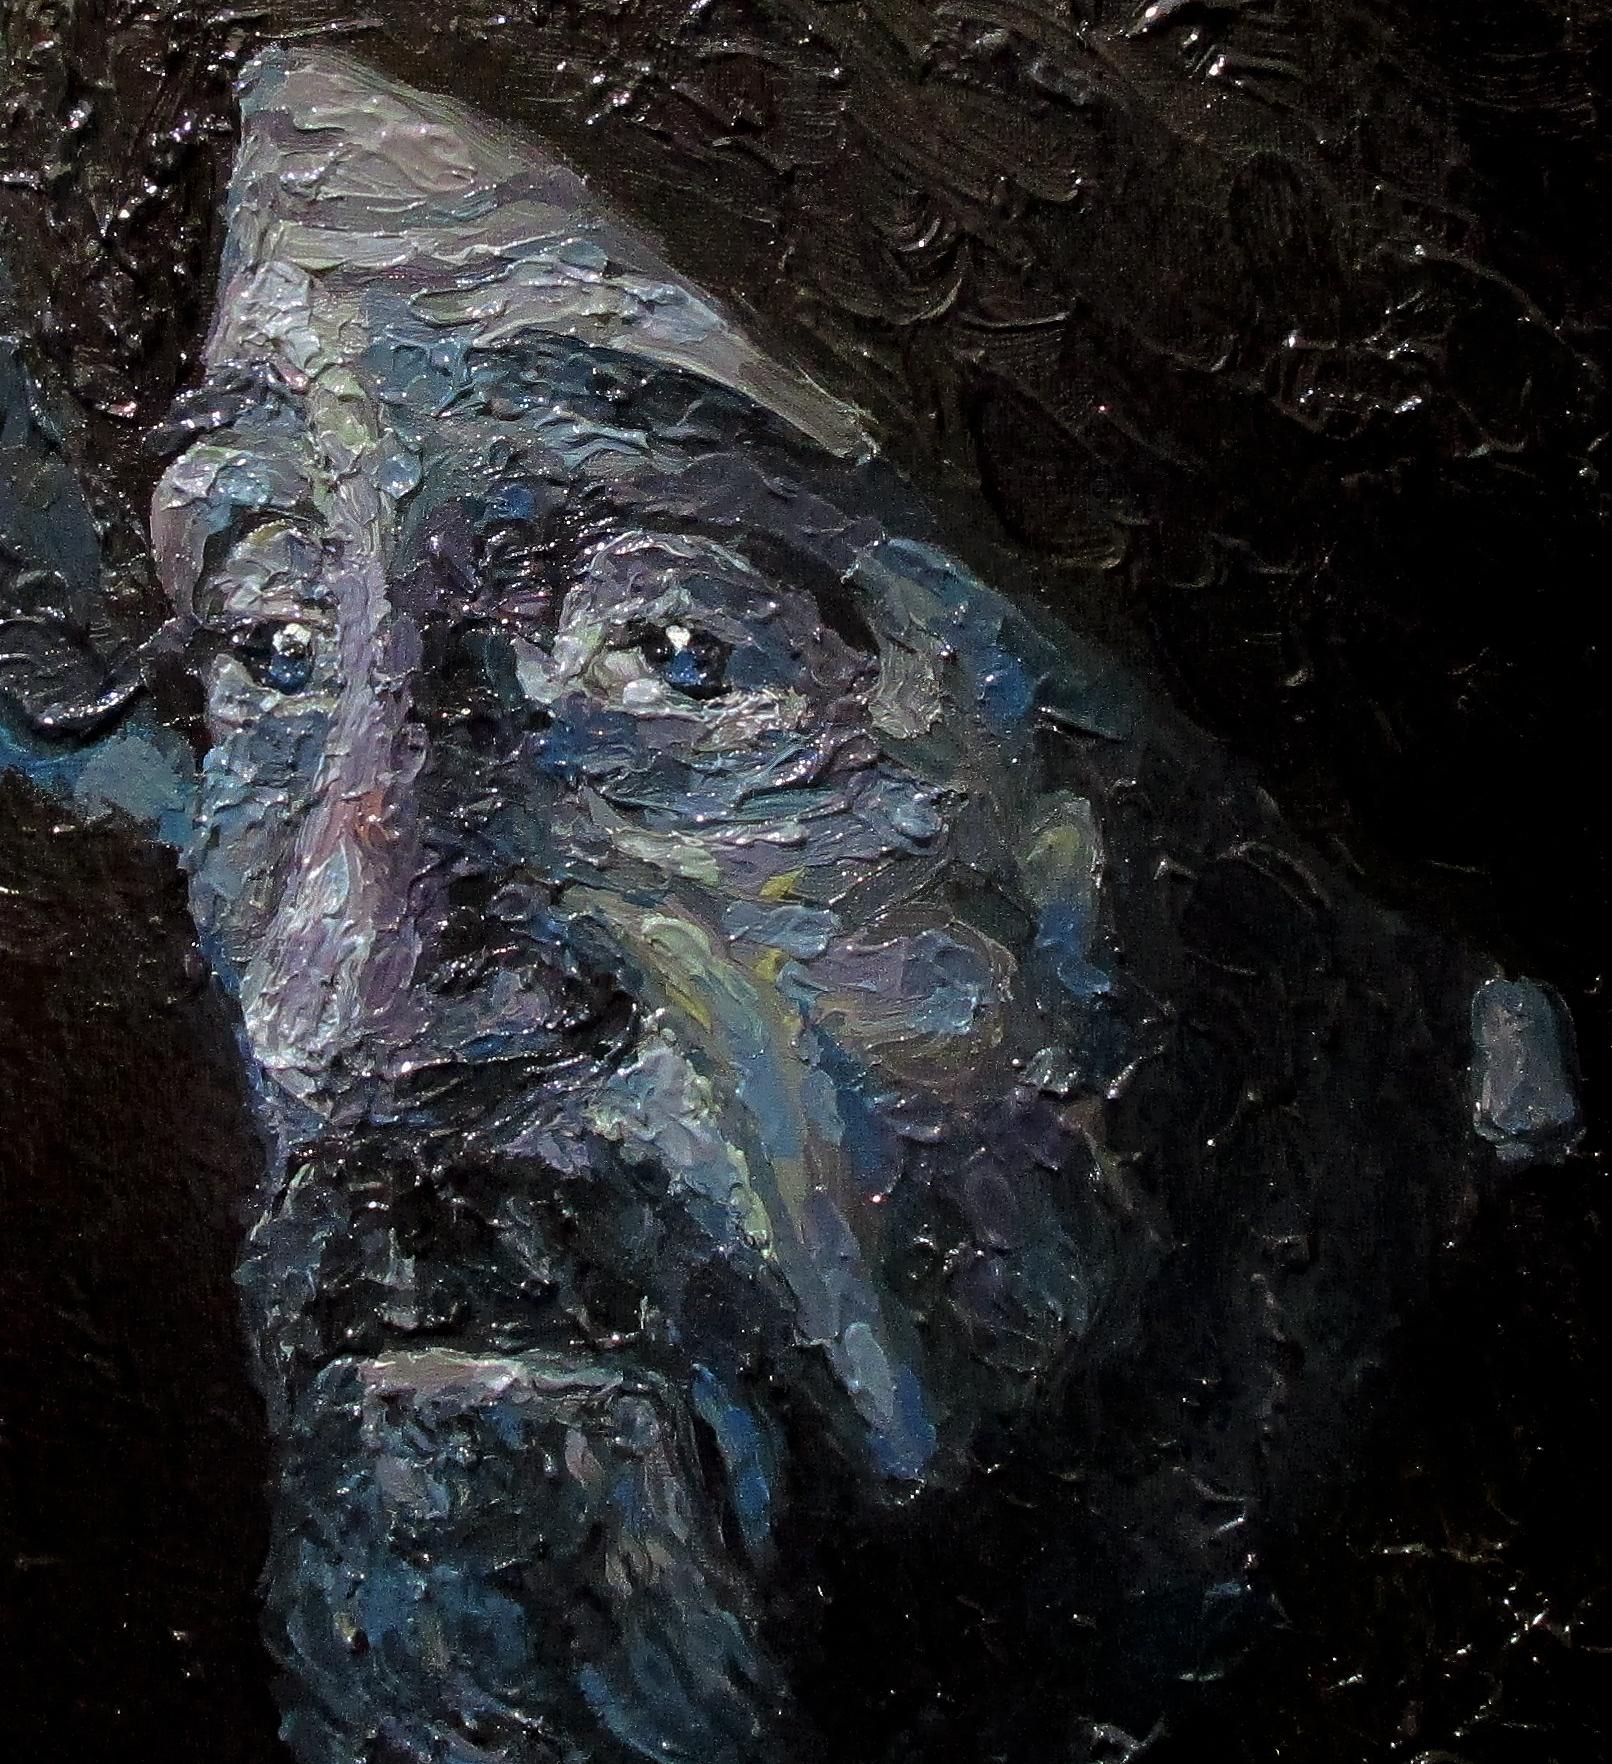 serkan ergun severe painting style